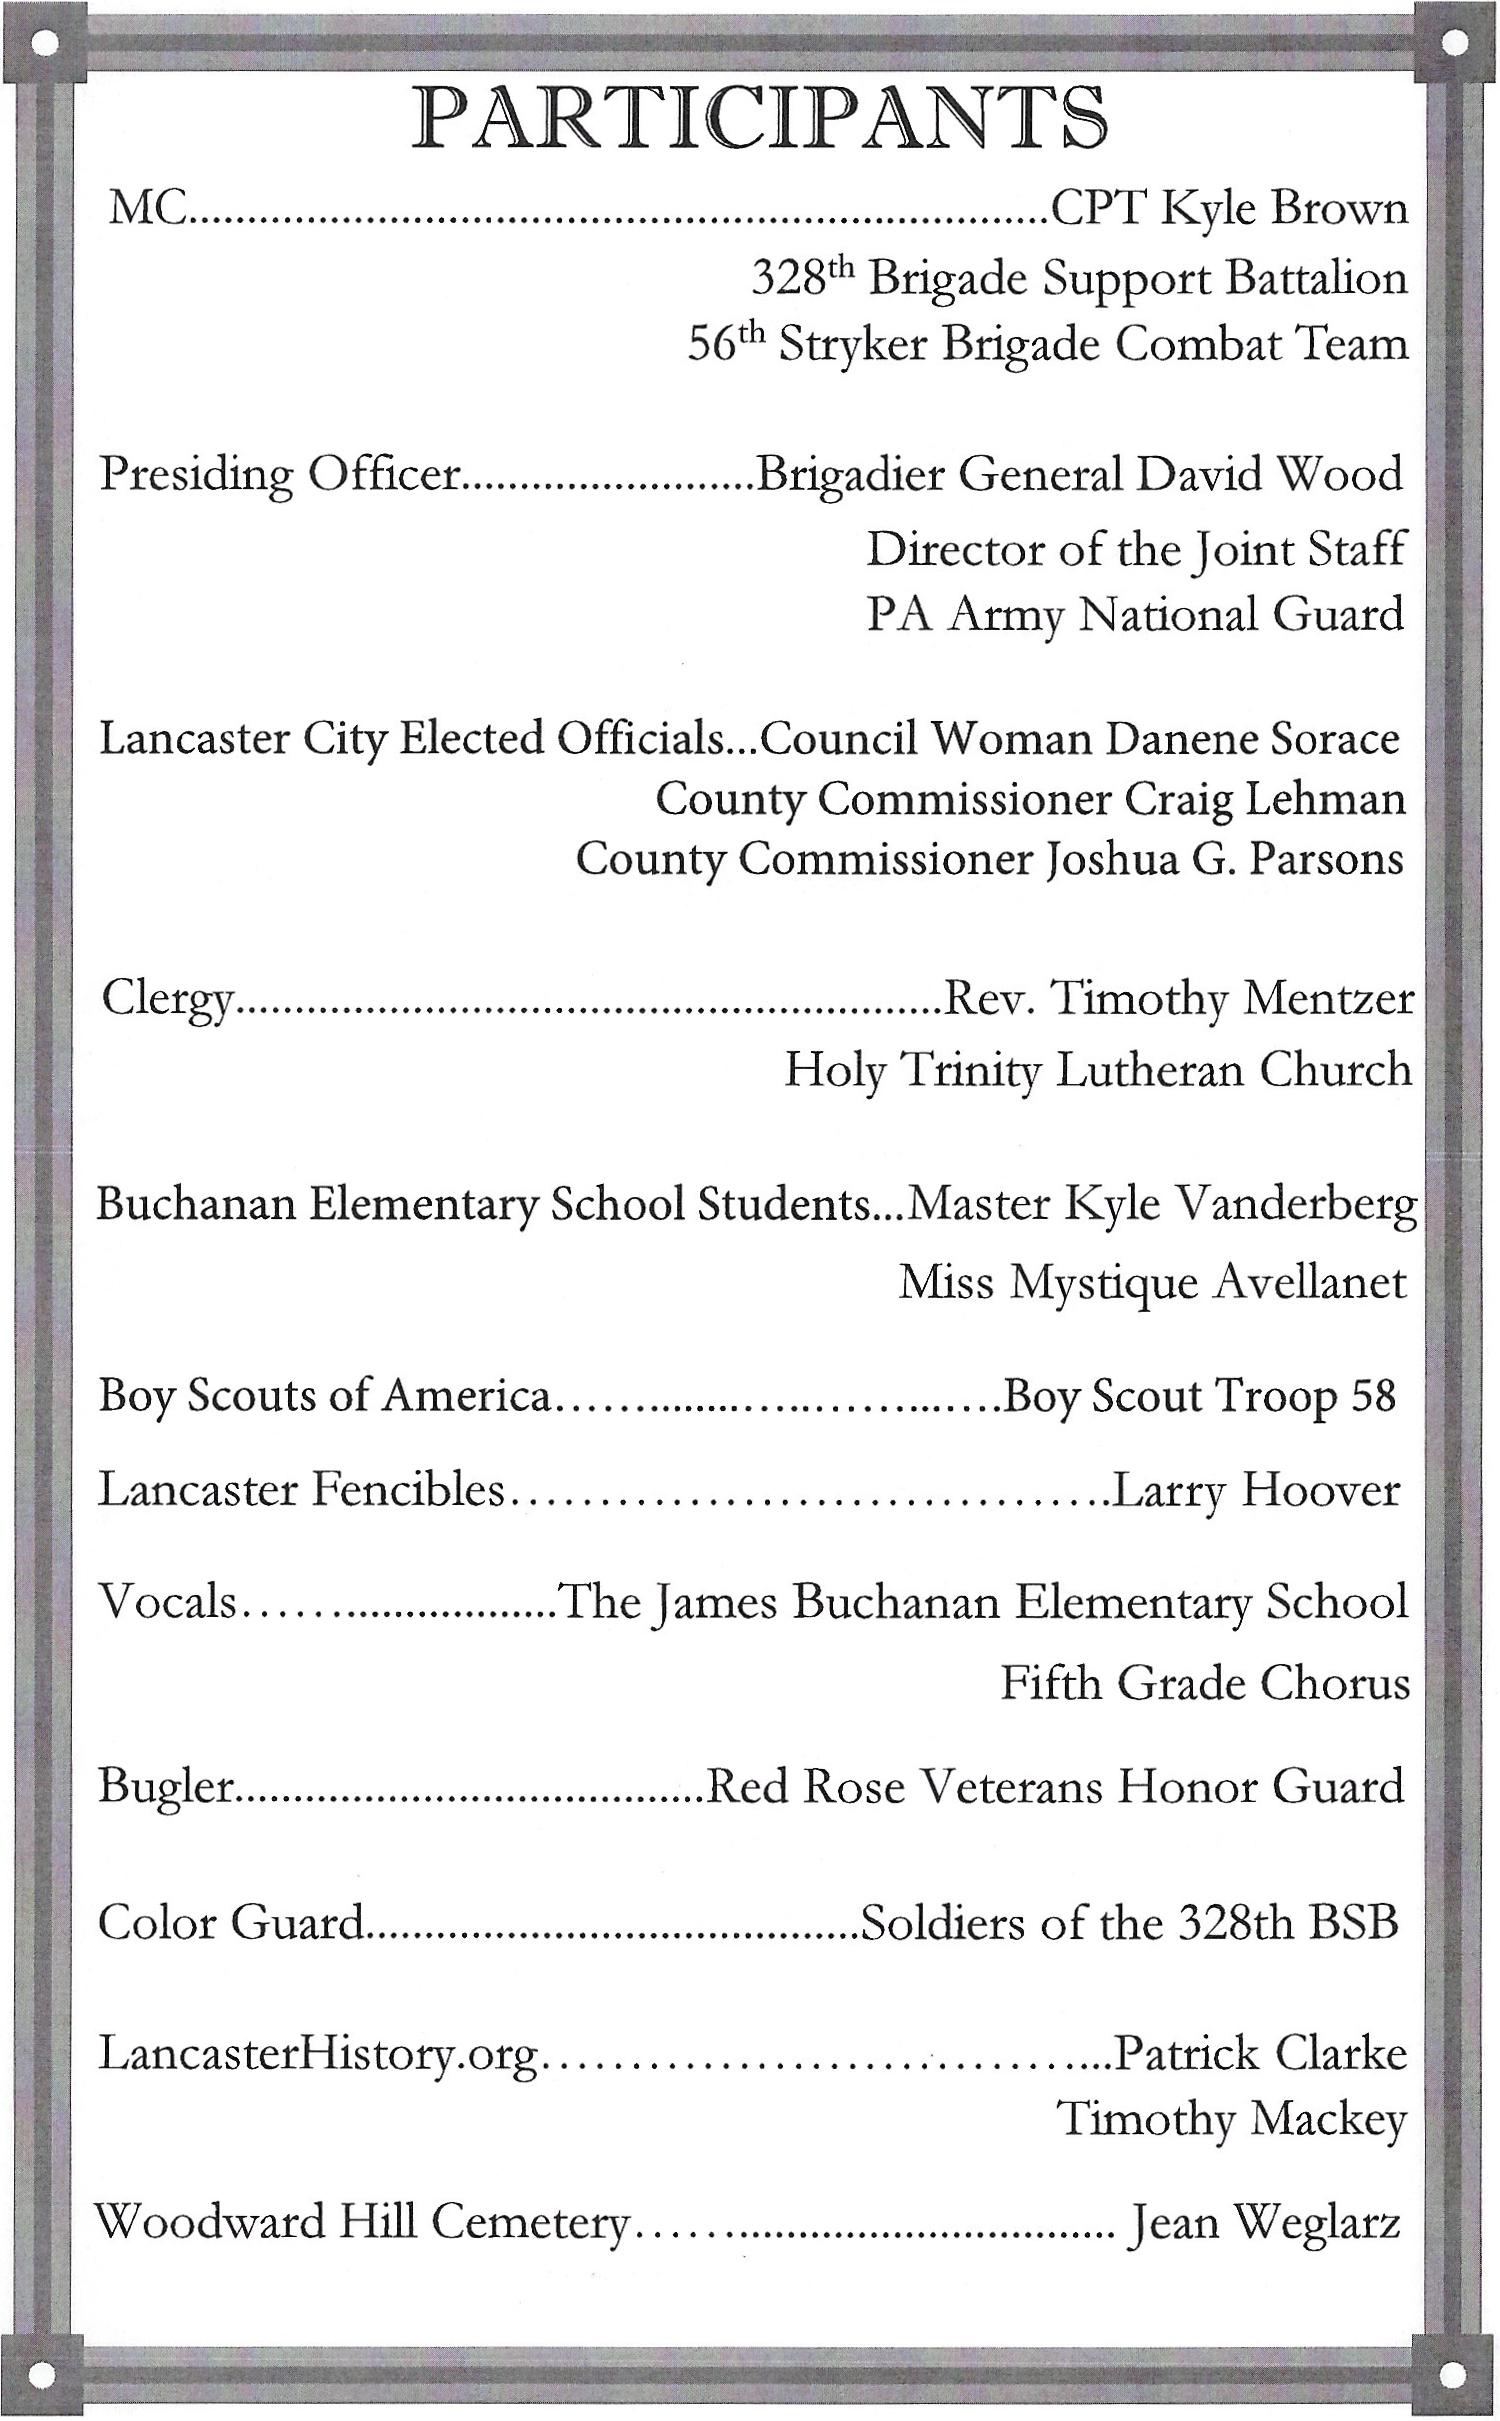 170422 Buchanan wreath laying ceremony program Participants page.jpg